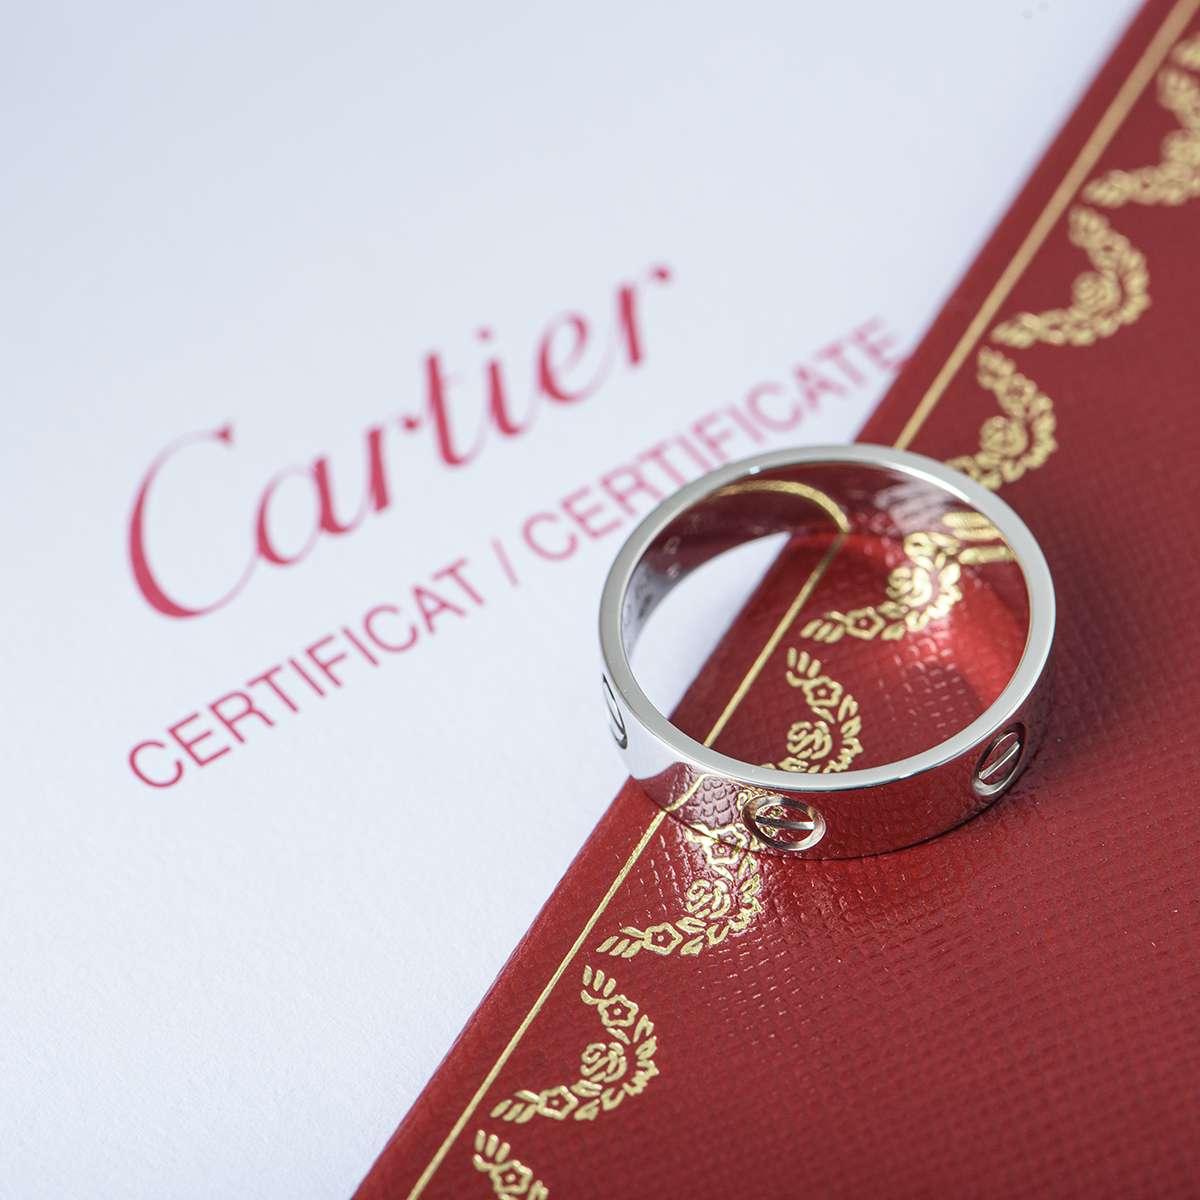 Cartier White Gold Plain Love Ring Size 55 B4084700